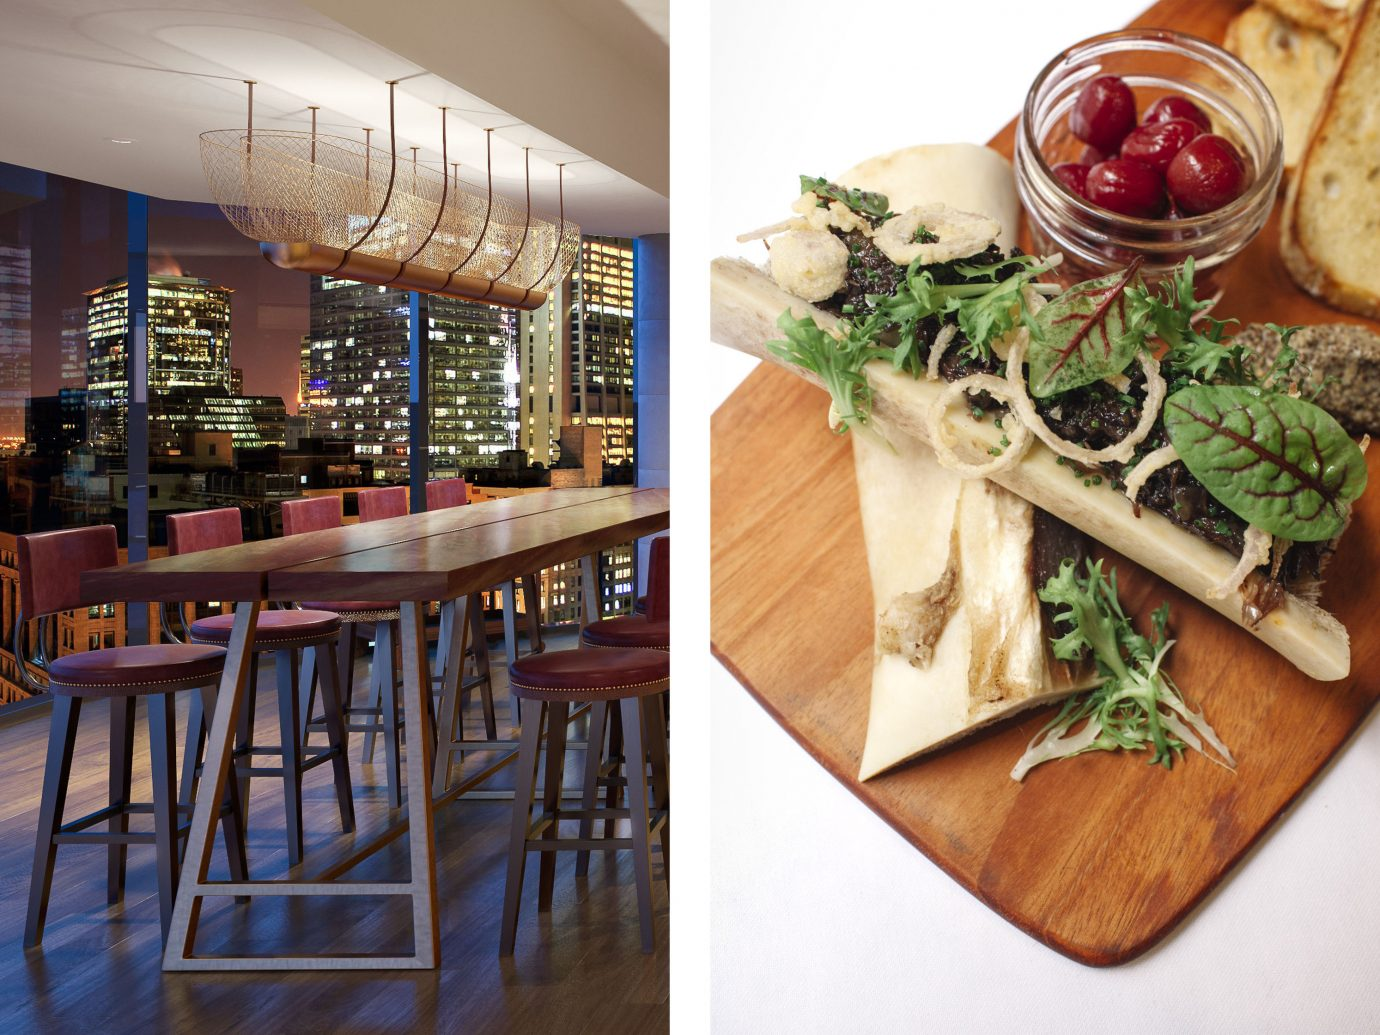 Food + Drink table floor indoor restaurant meal brunch lunch floristry food wood